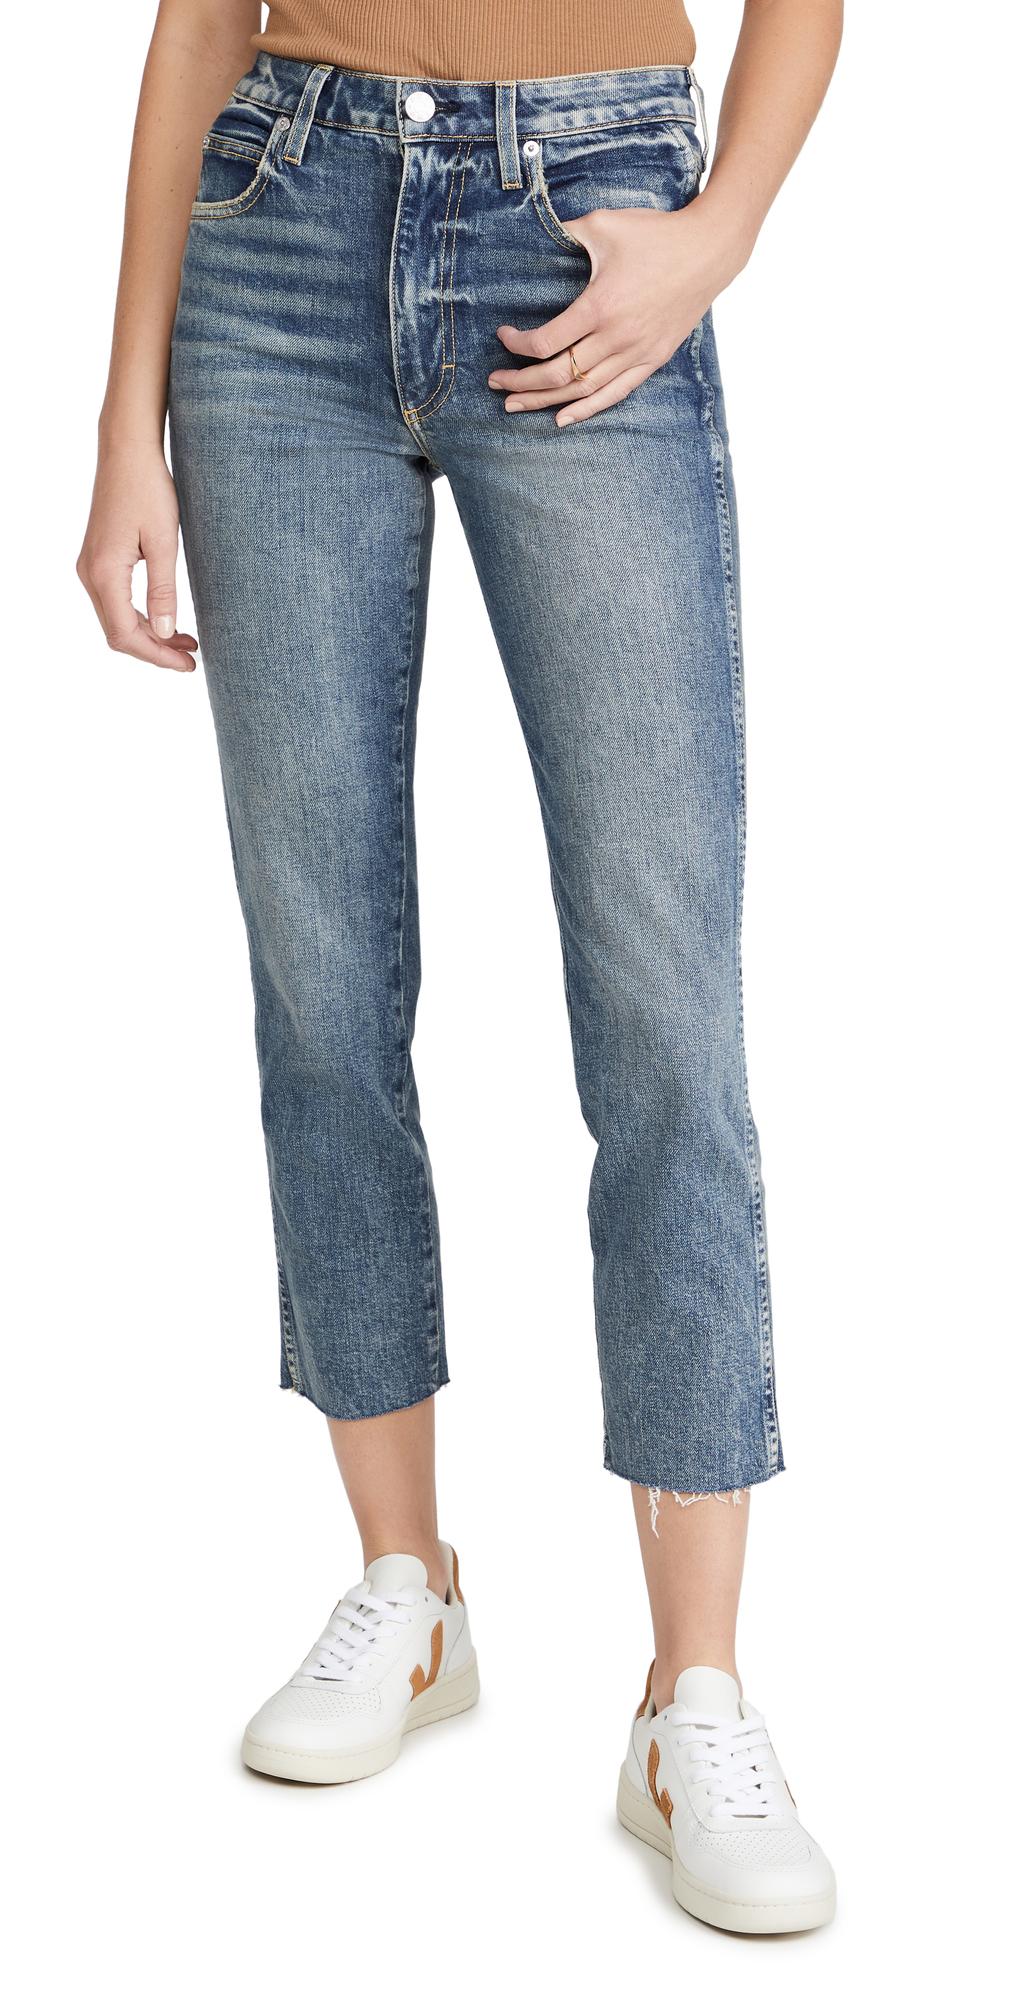 Chloe Crop Raw Hem Jeans